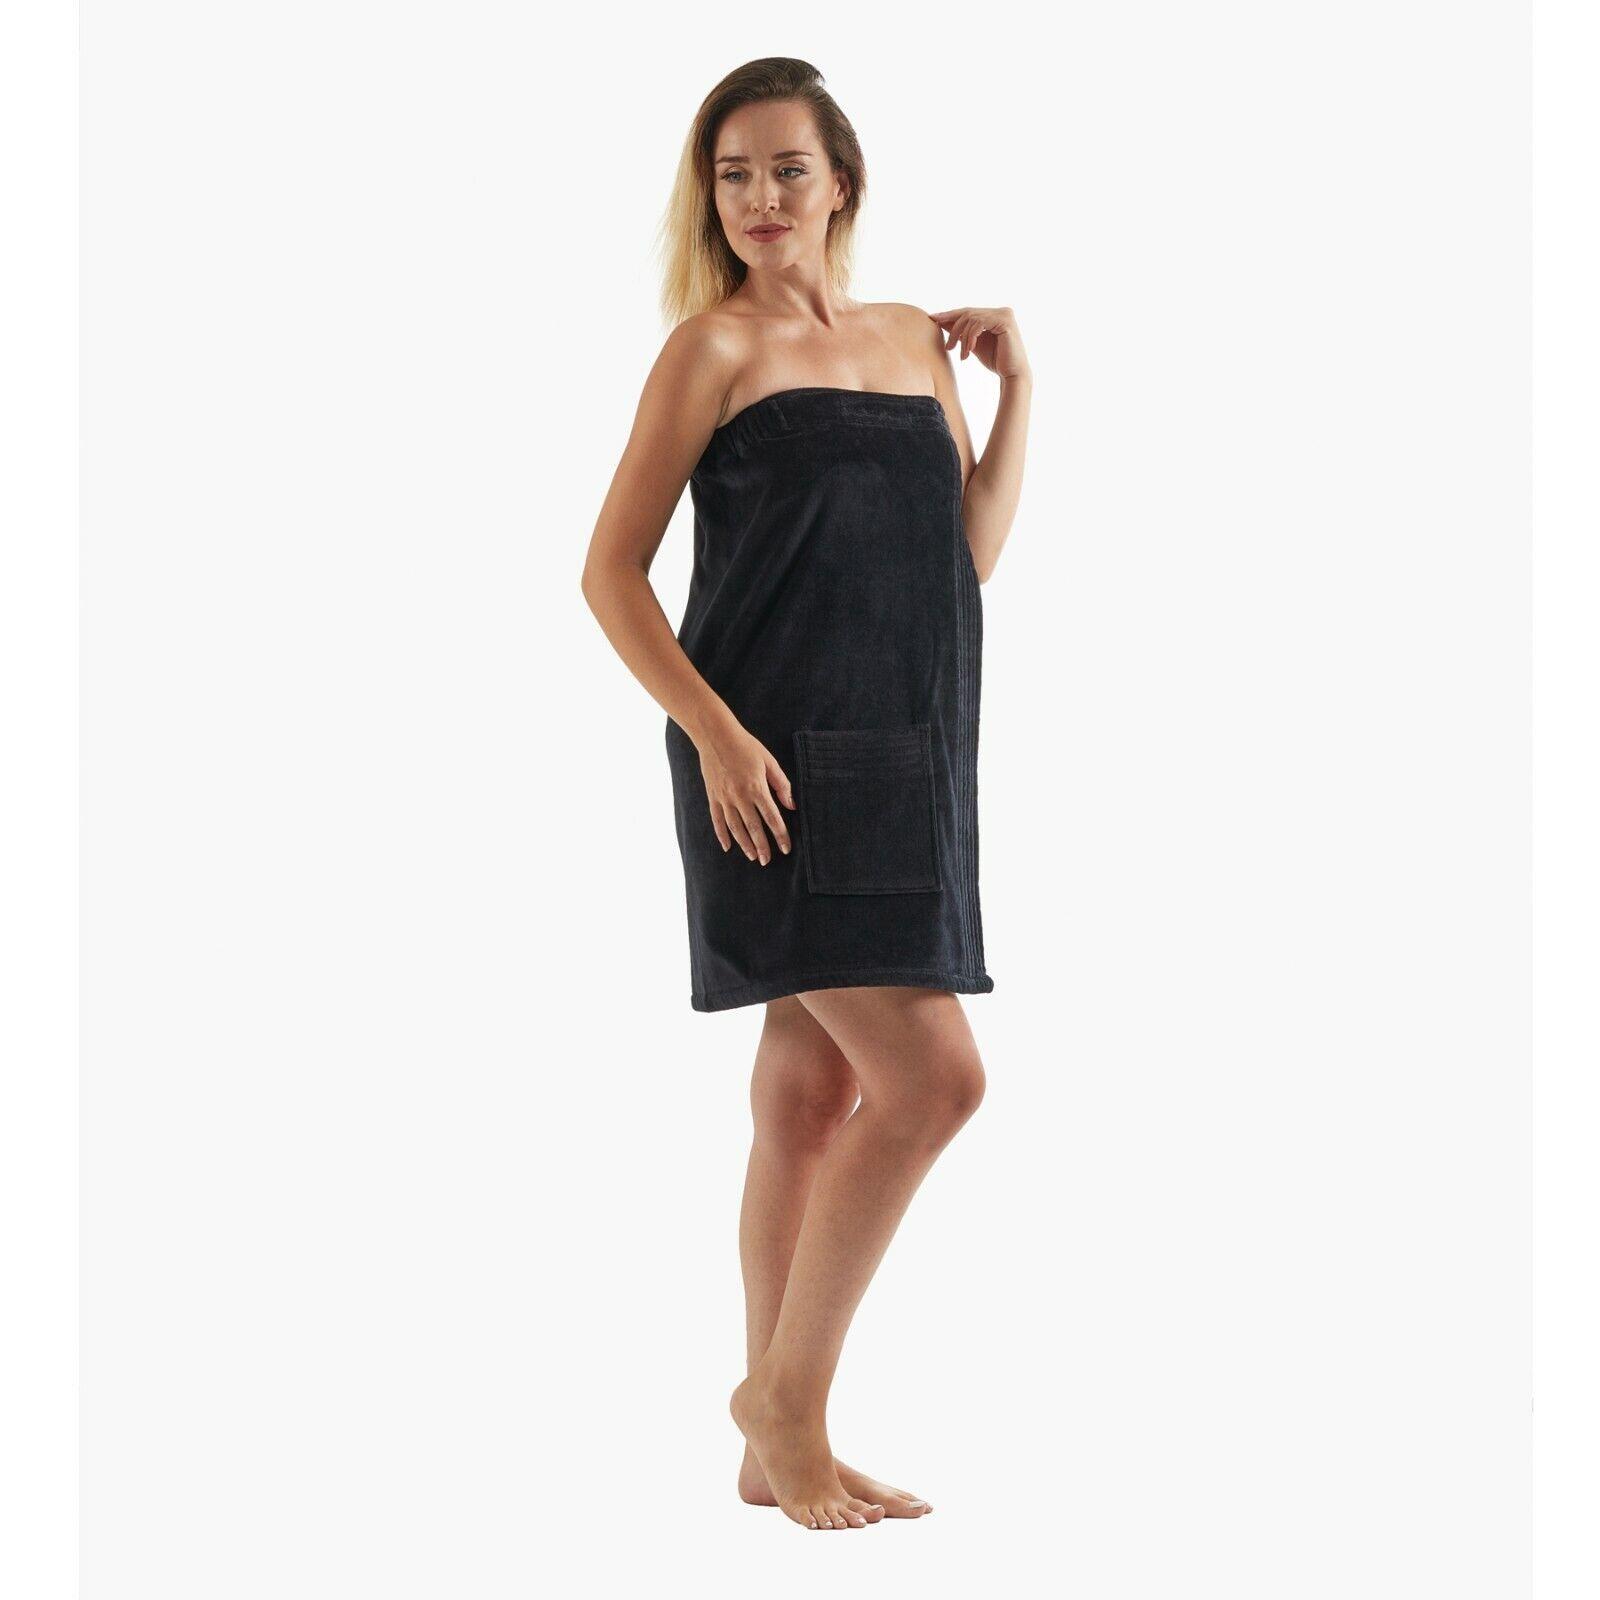 Women's 100% Organic Cotton Adjustable Towel Wraps for Spa G